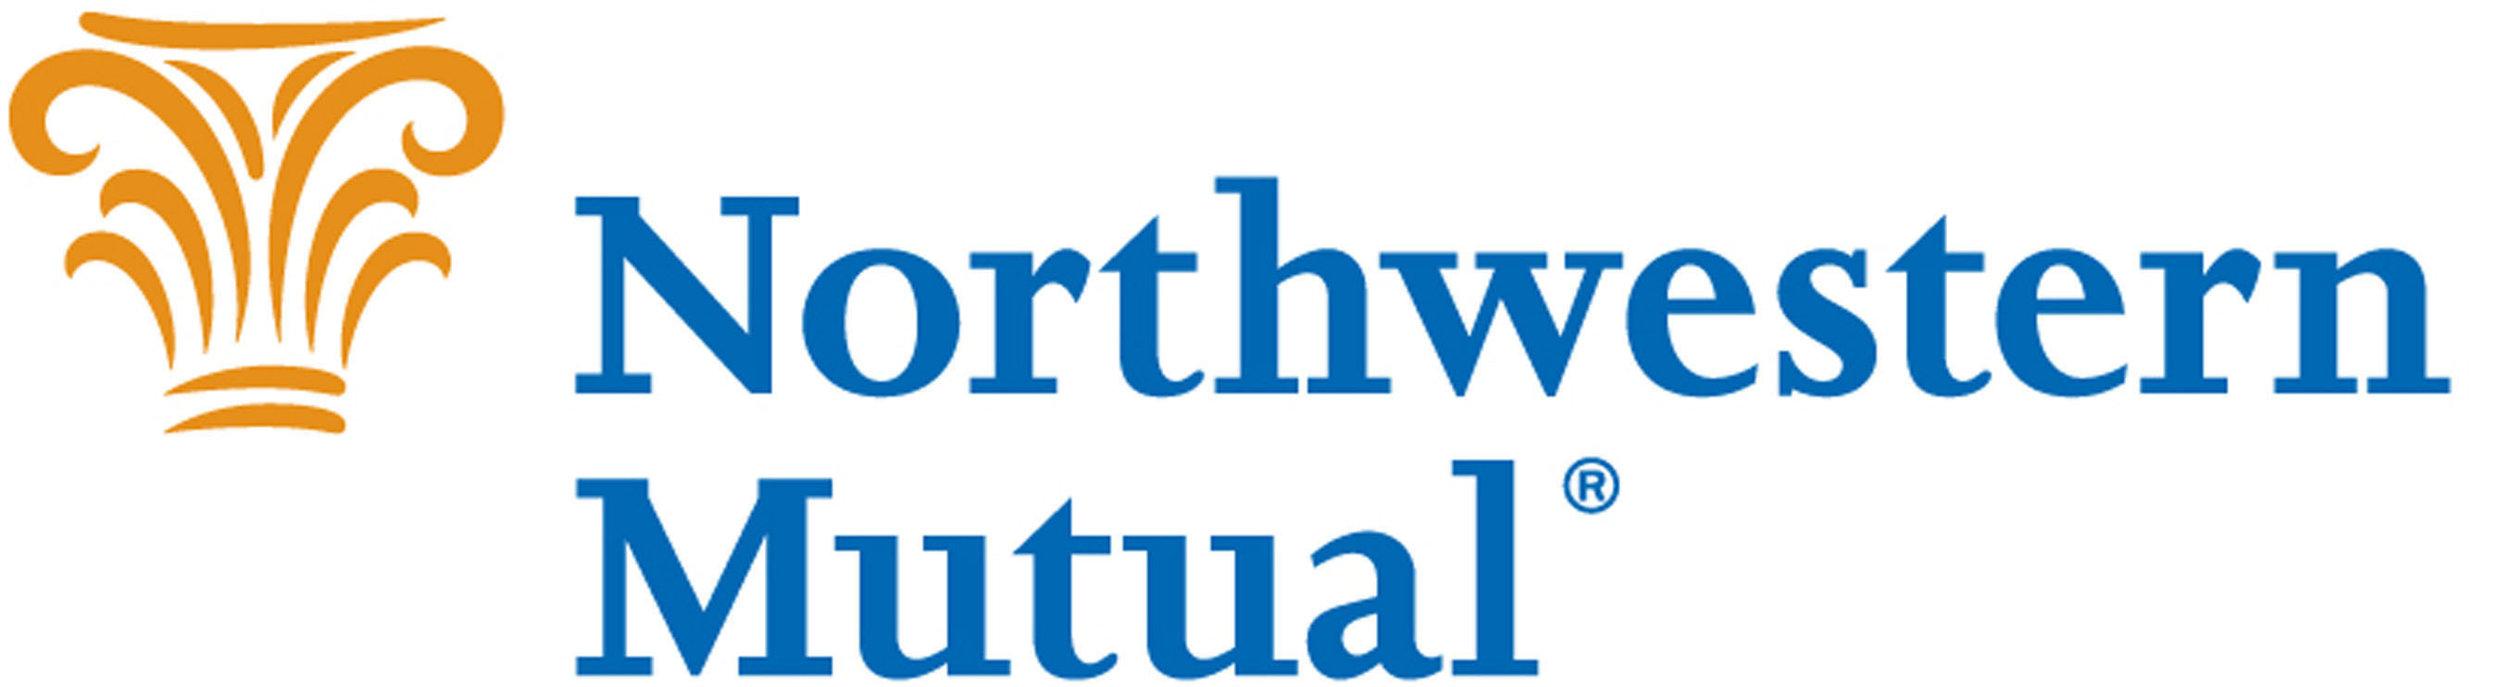 Northwestern-Mutual-LOGO.jpg